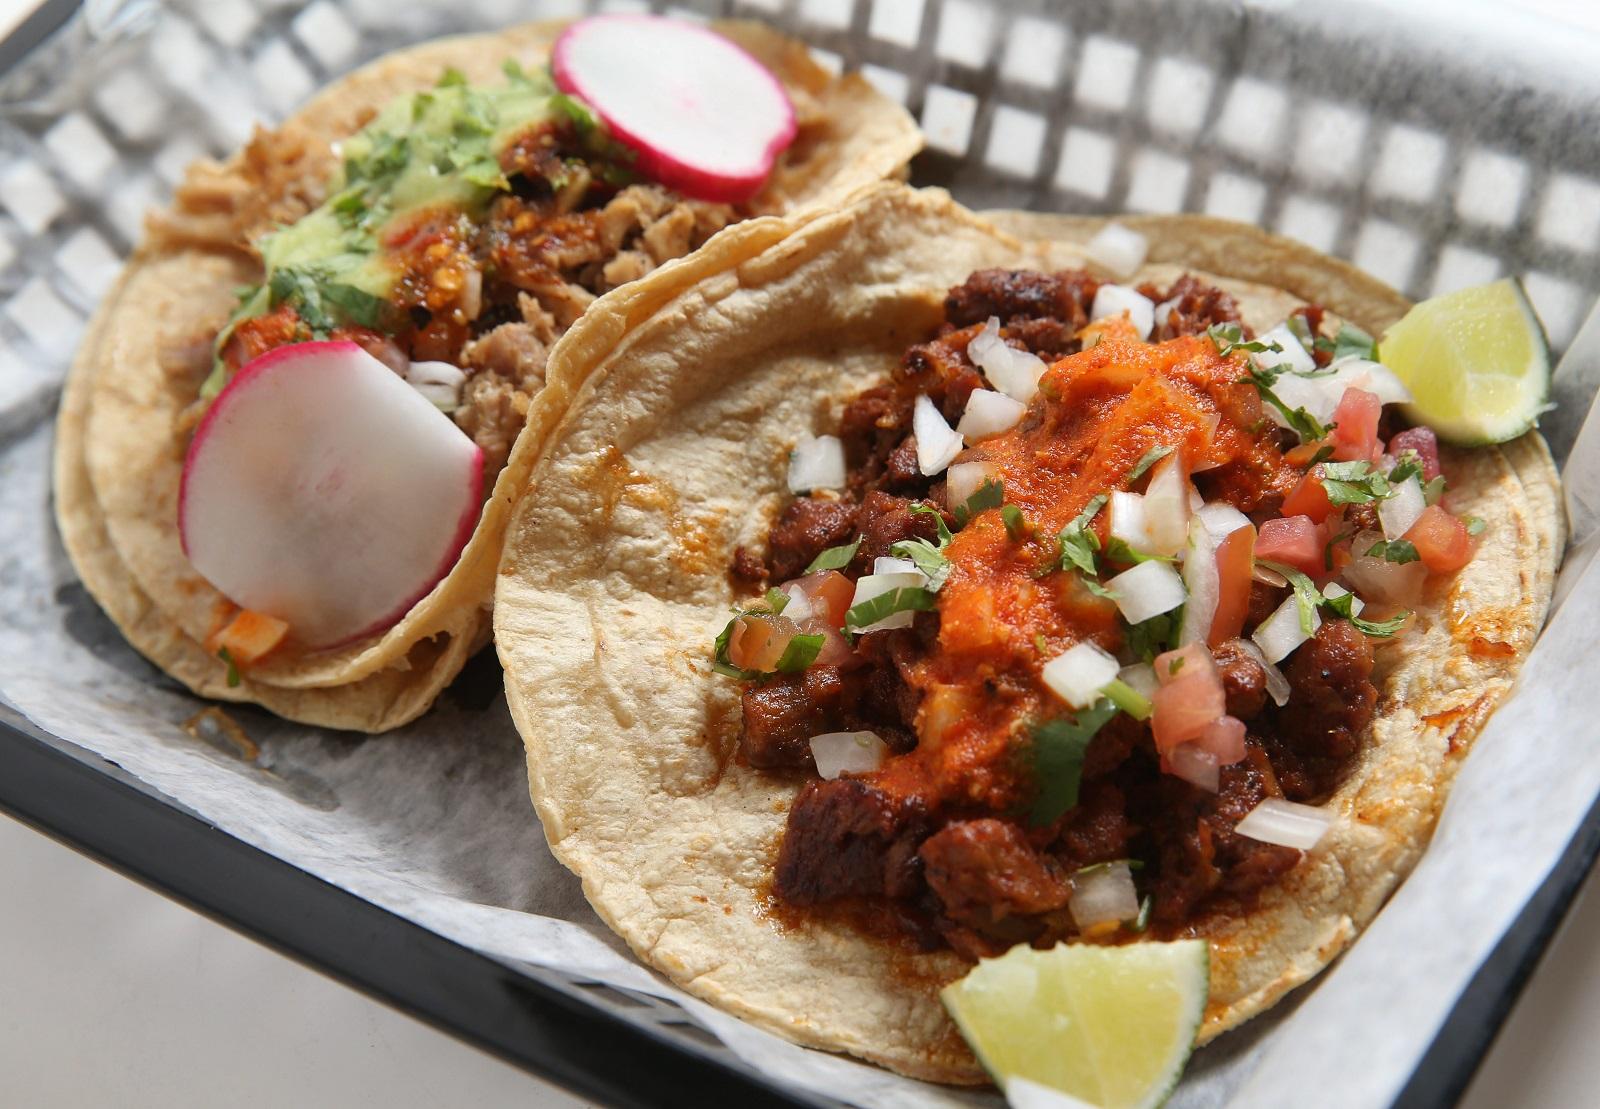 La Divina Dos offers tacos like carnitas (left) and al pastor (right)(Sharon Cantillon/Buffalo News)